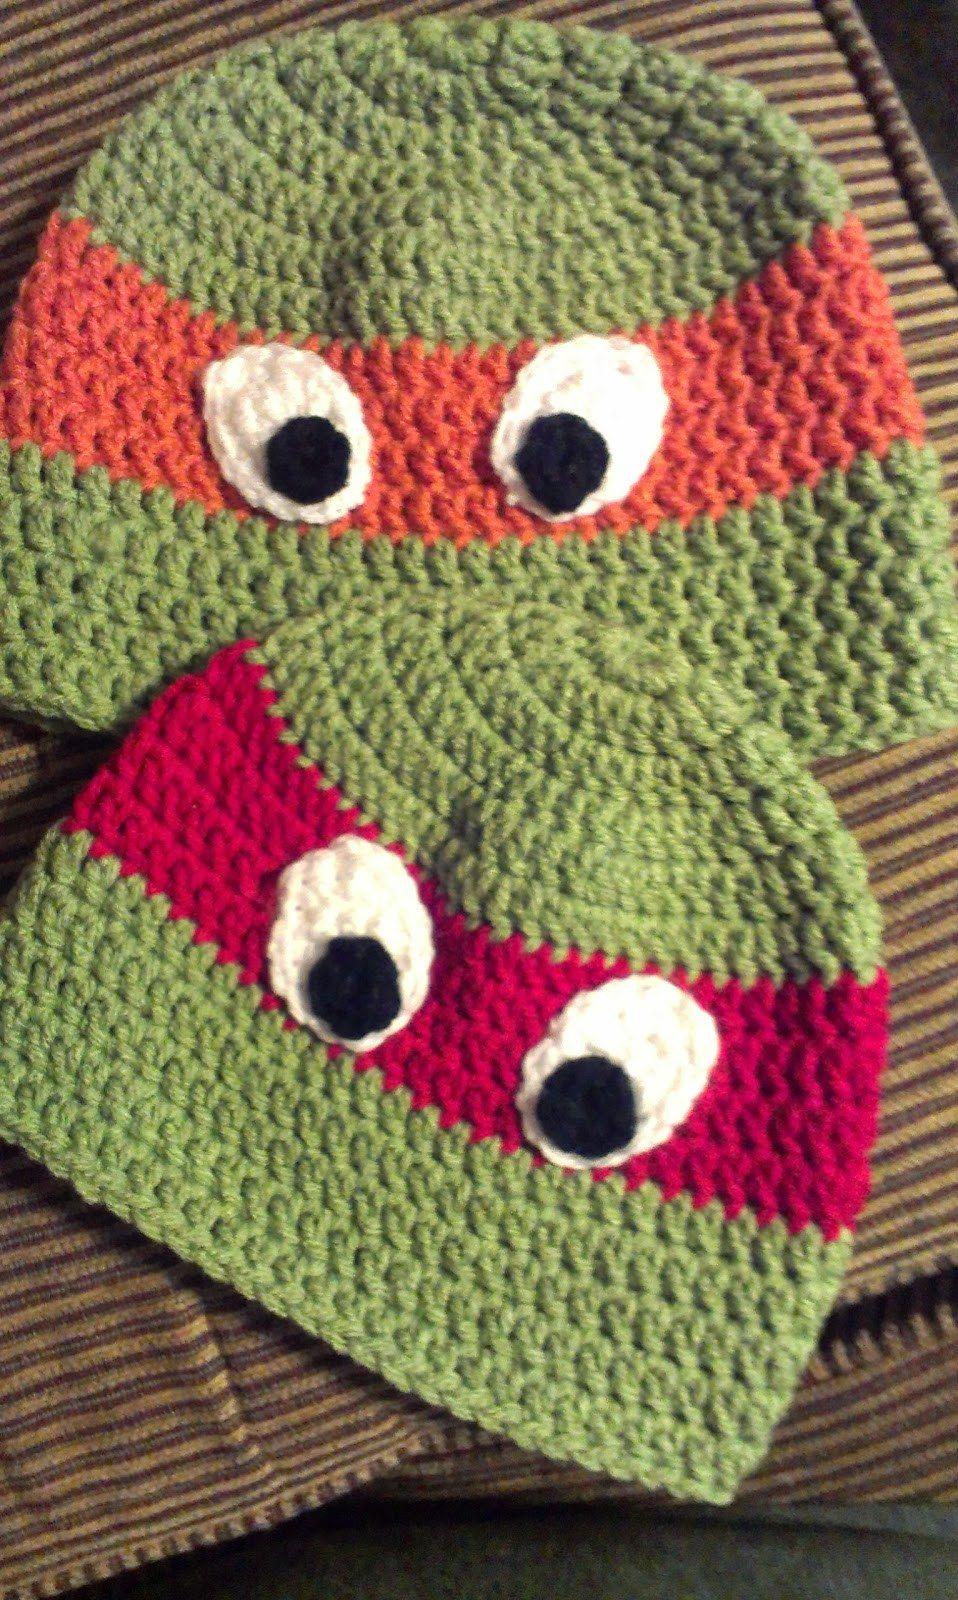 Ninja Crochet Pattern Free Tutorials and Great Ideas | Pinterest ...